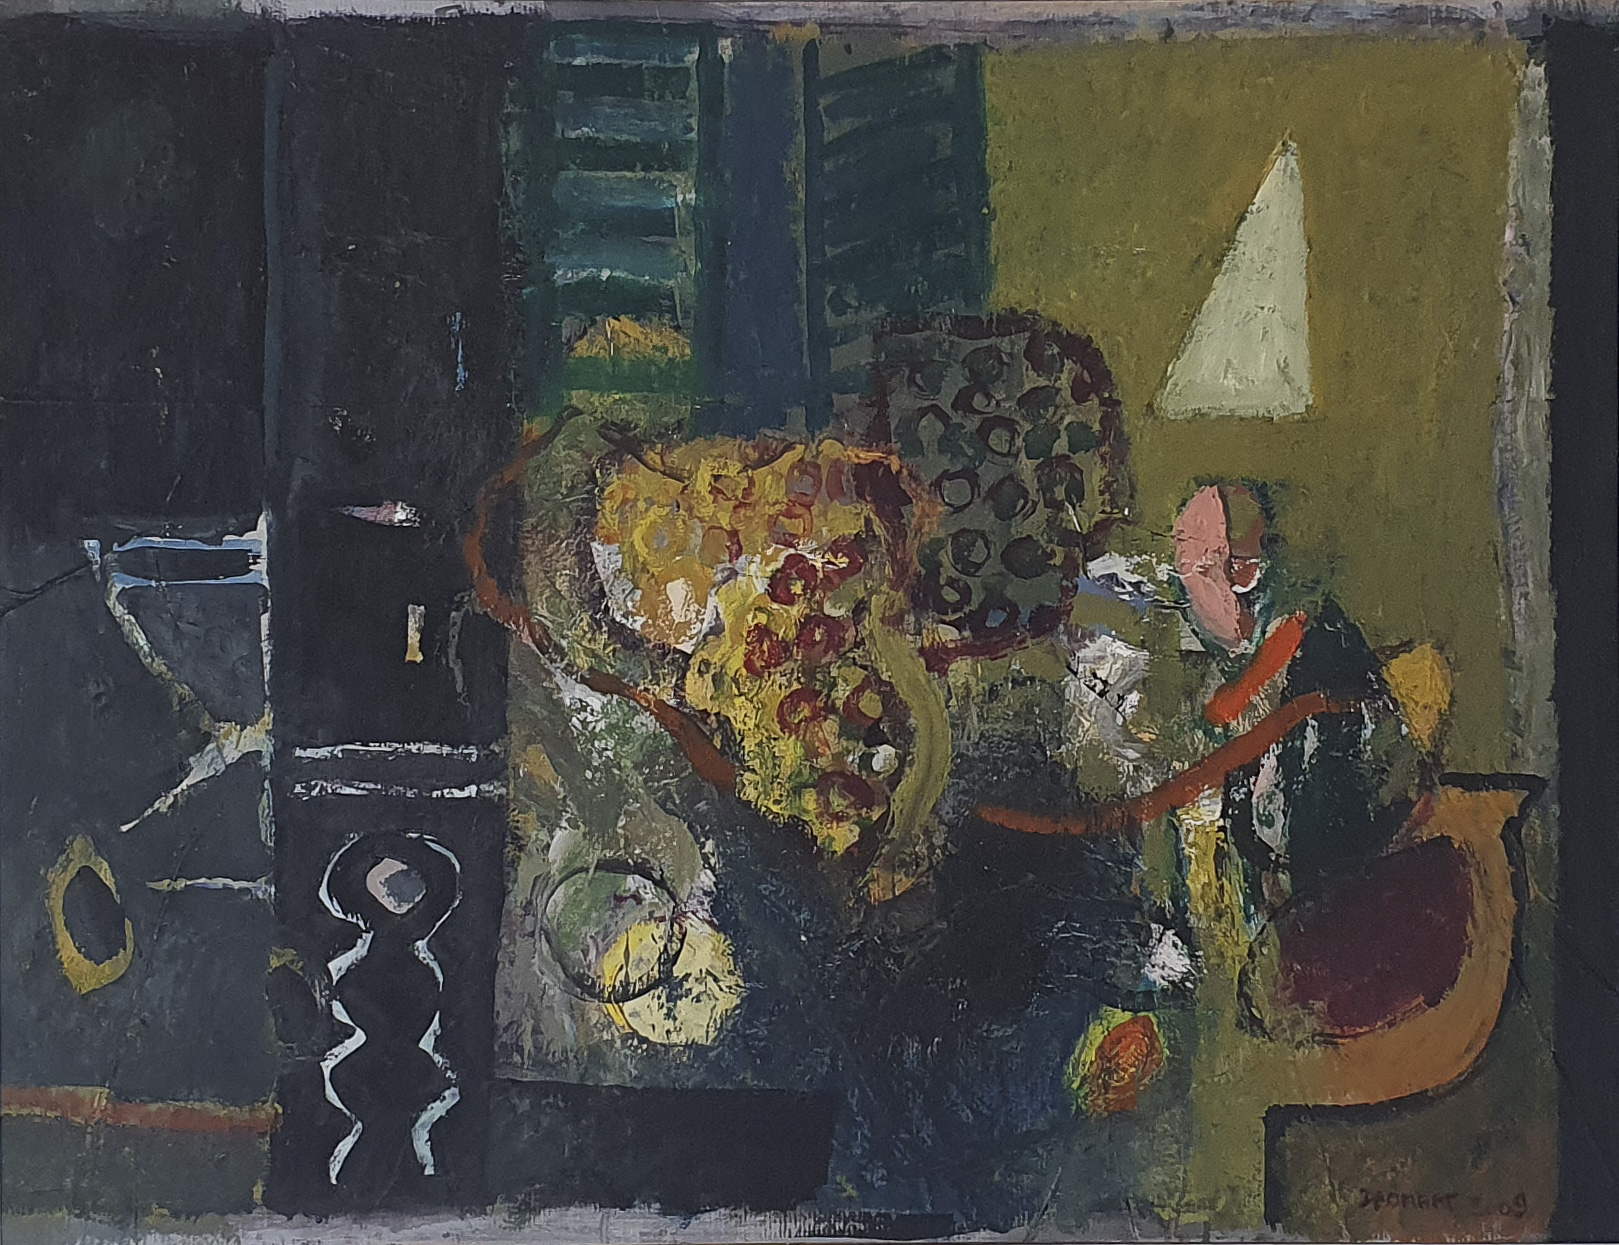 Jacques DROMART